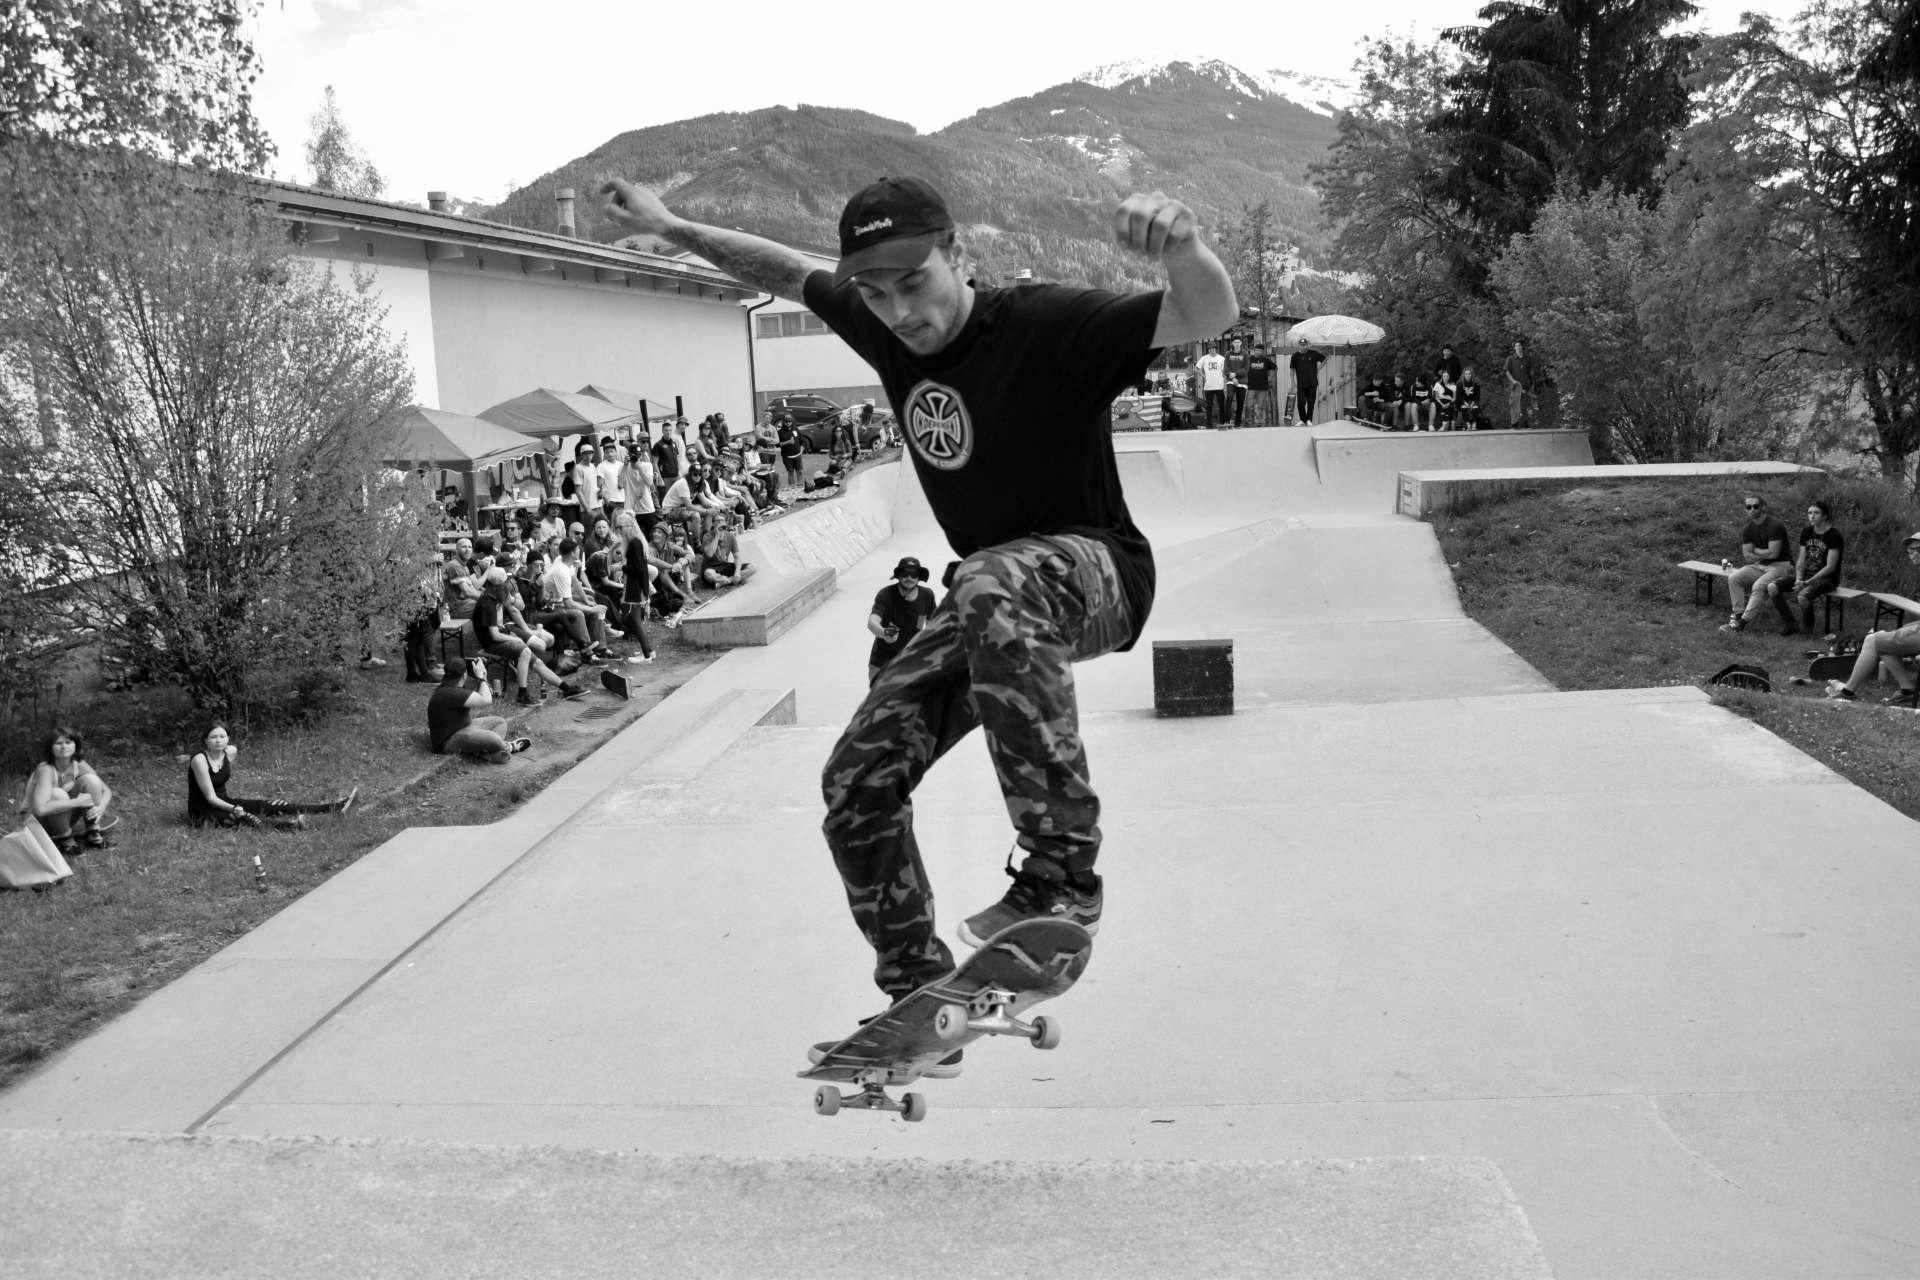 skateboard headz fieberbrunn kgt kitz gau trophy 2019 saalfelden00044